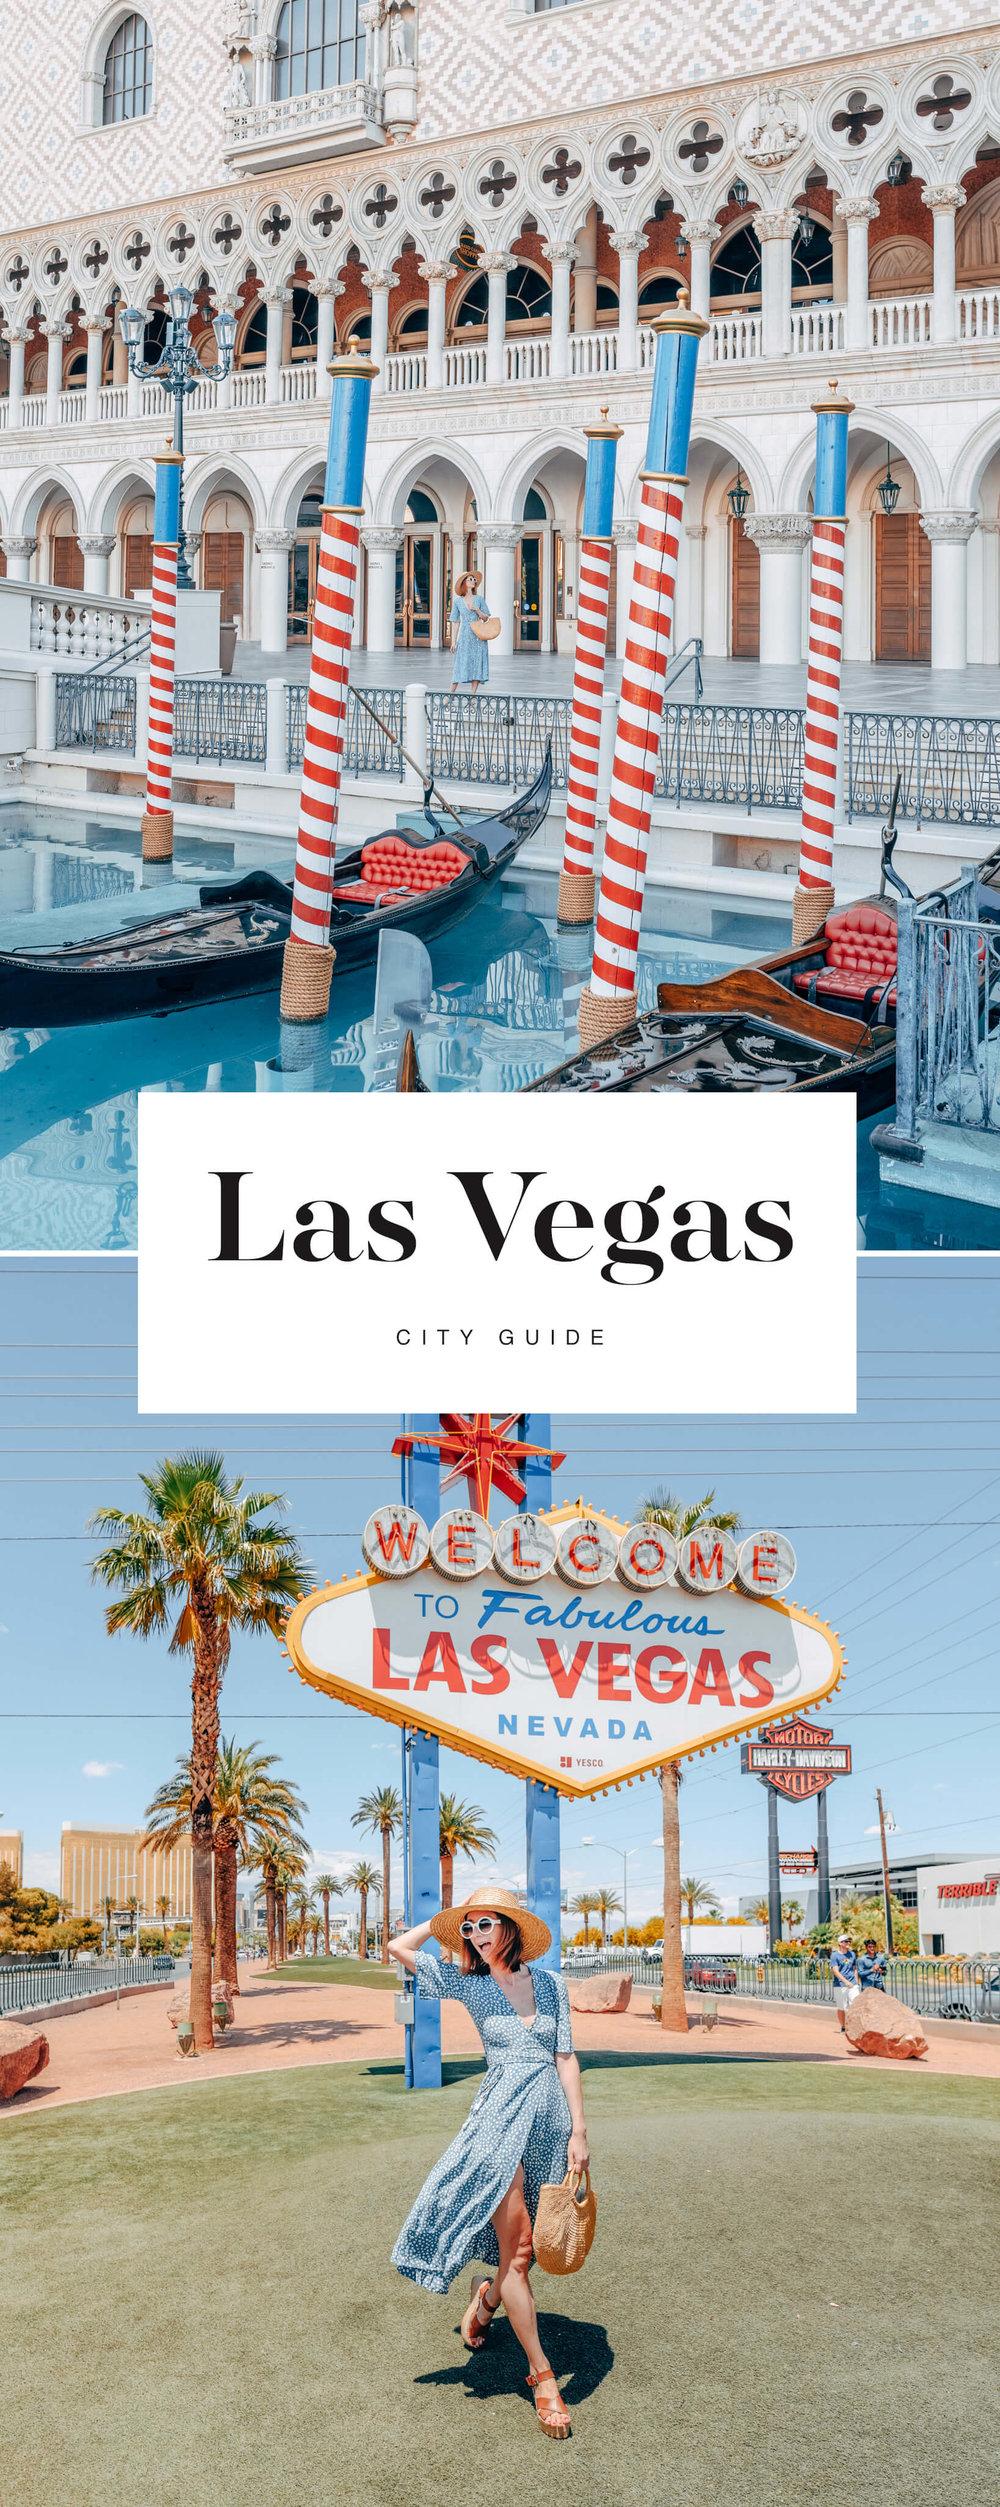 Best-ever-Las-Vegas-city-guide.jpg